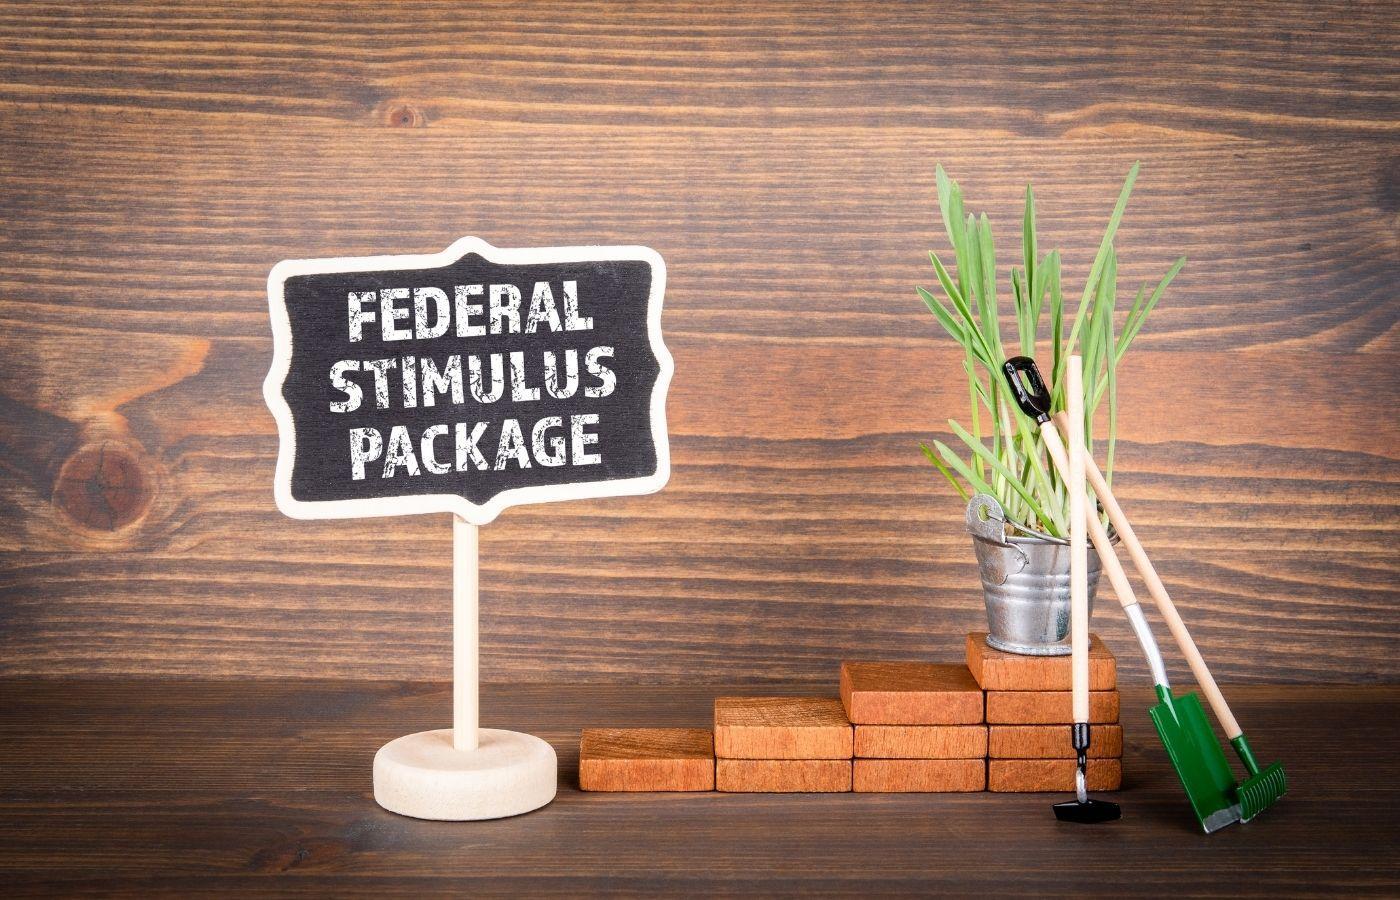 Stimulus 3.0: Recovery Rebates Thumbnail